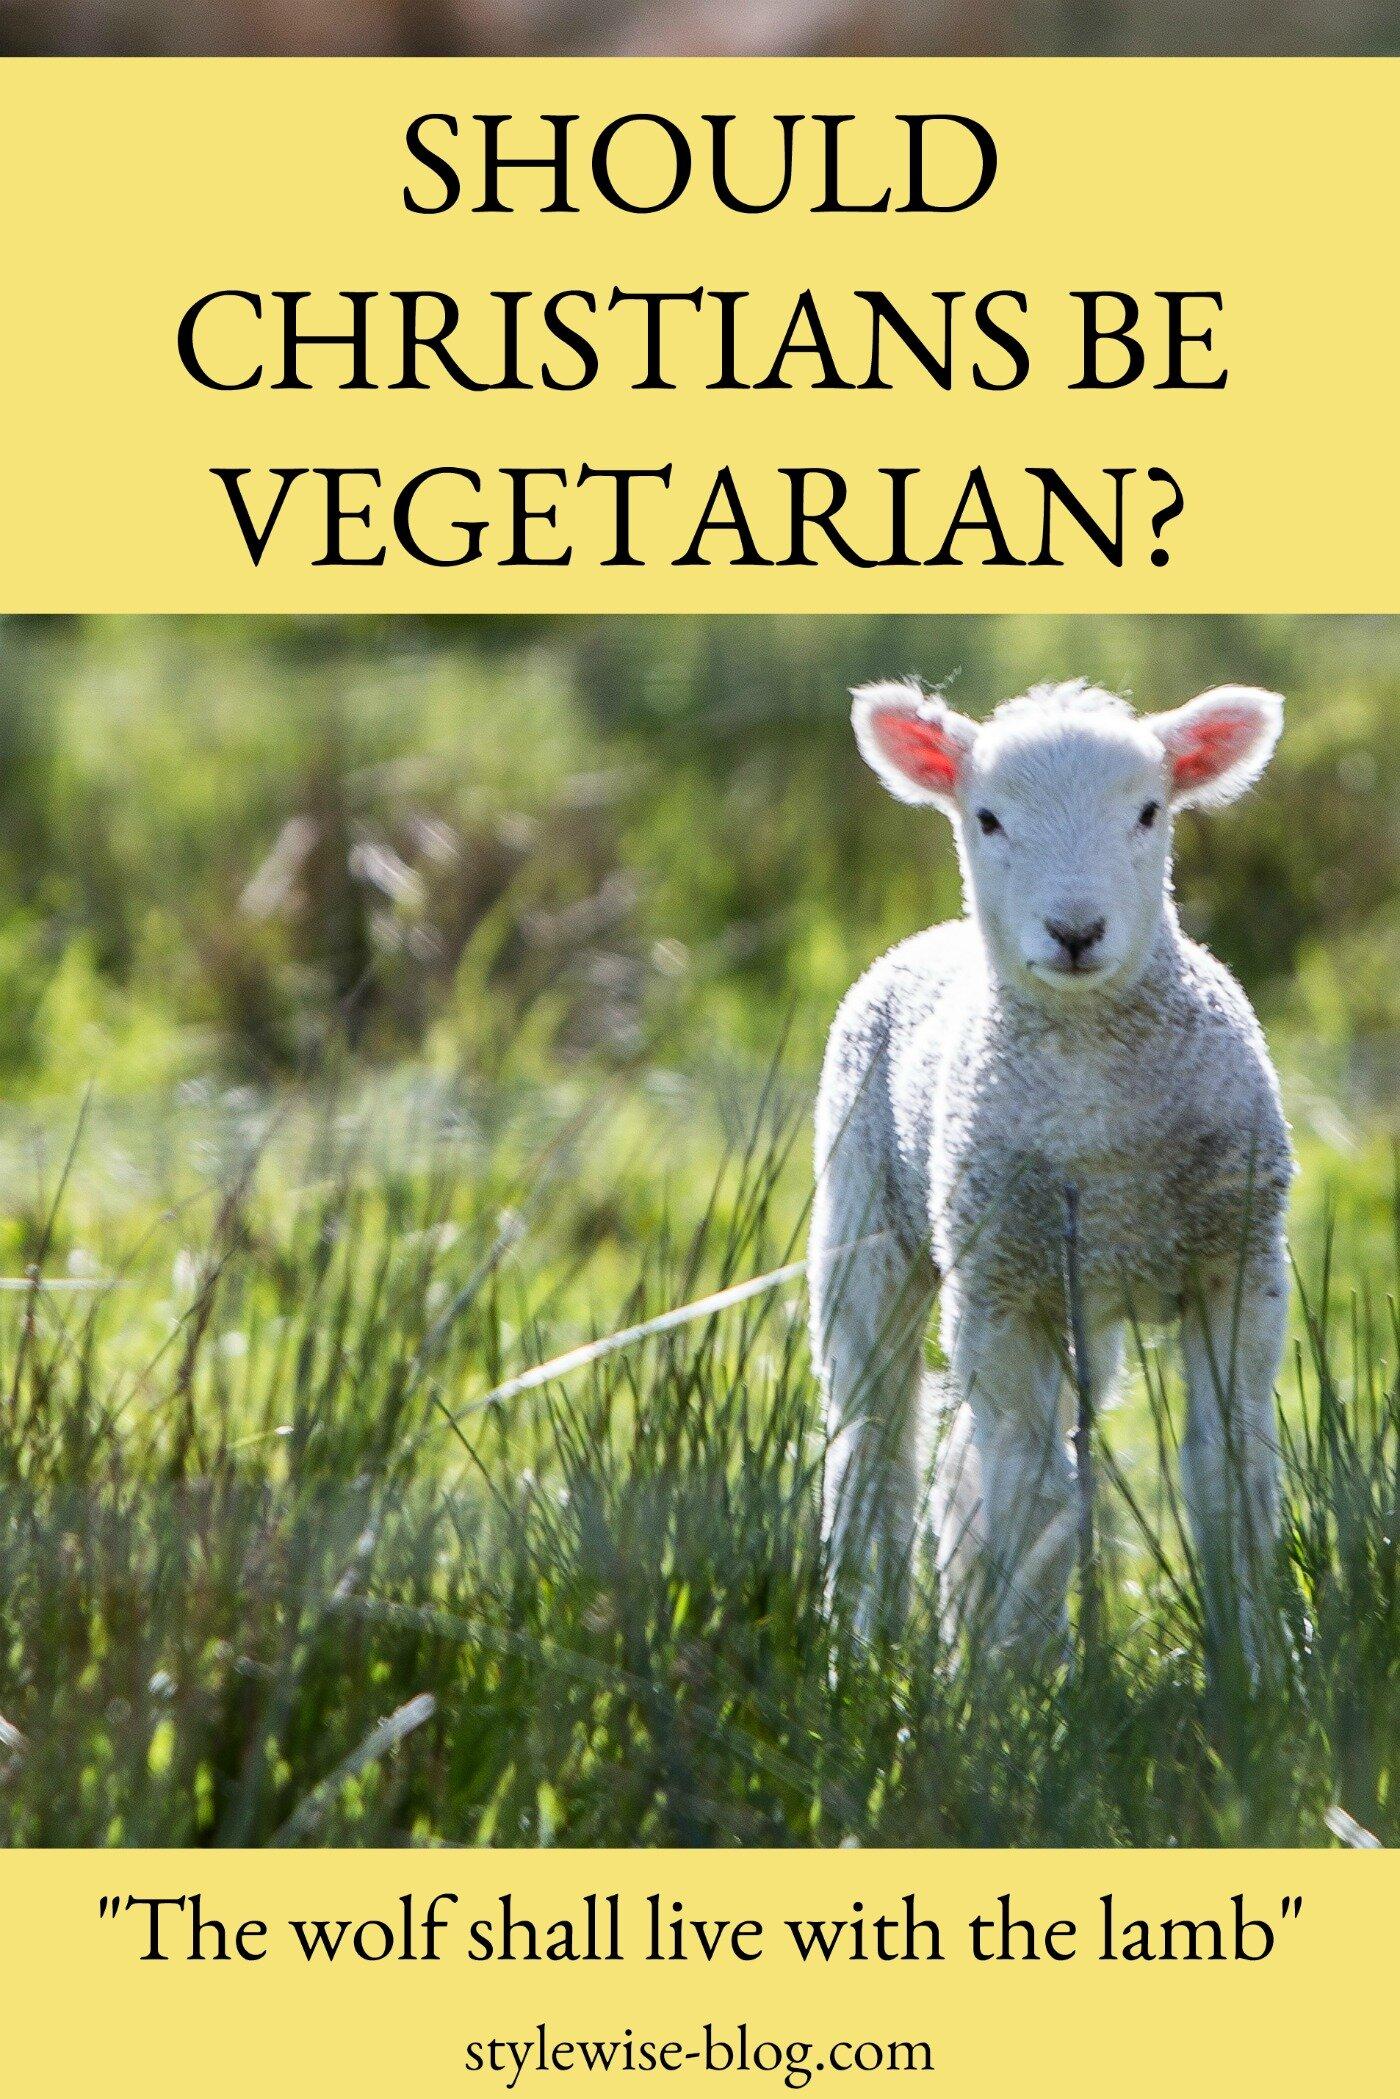 Should Christians be vegetarian